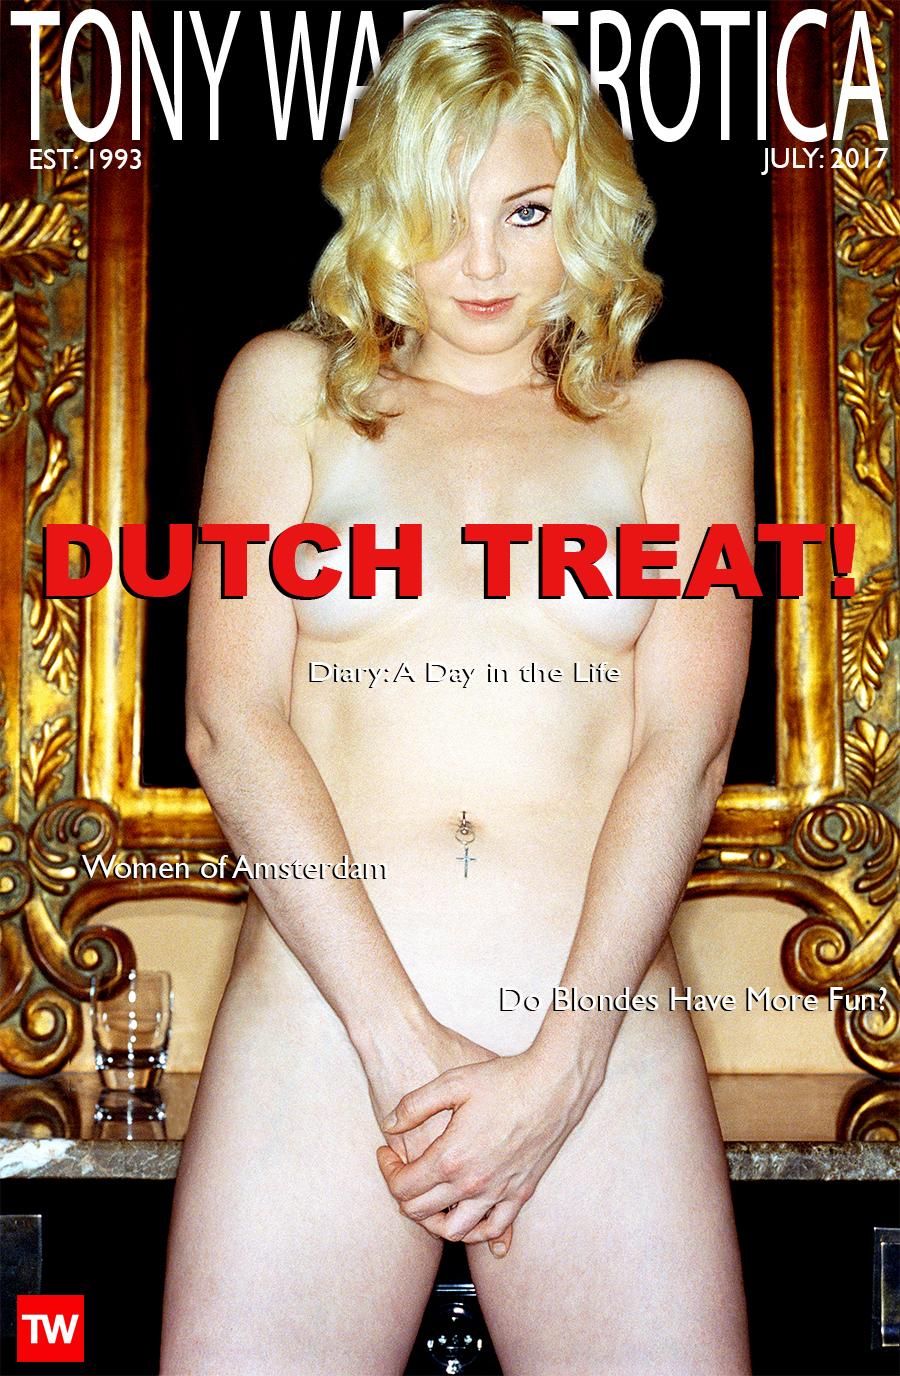 Tony_Ward_Studio_erotica_erotic_photography_Dutch_model_Dagmar_Amsterdam_nudes_vintage_collectible_treats_blondes_nudity_eroticism